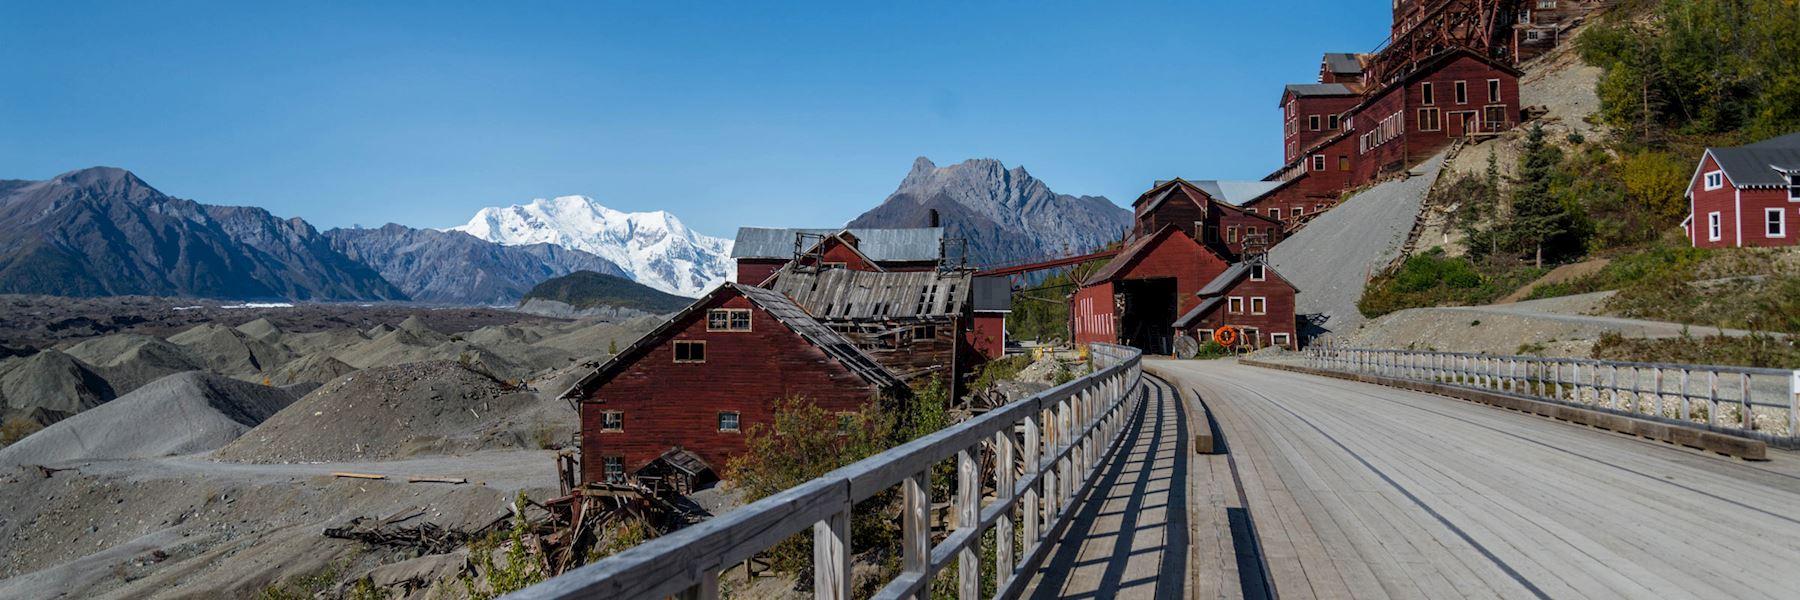 Visit McCarthy & Kennicott, Alaska